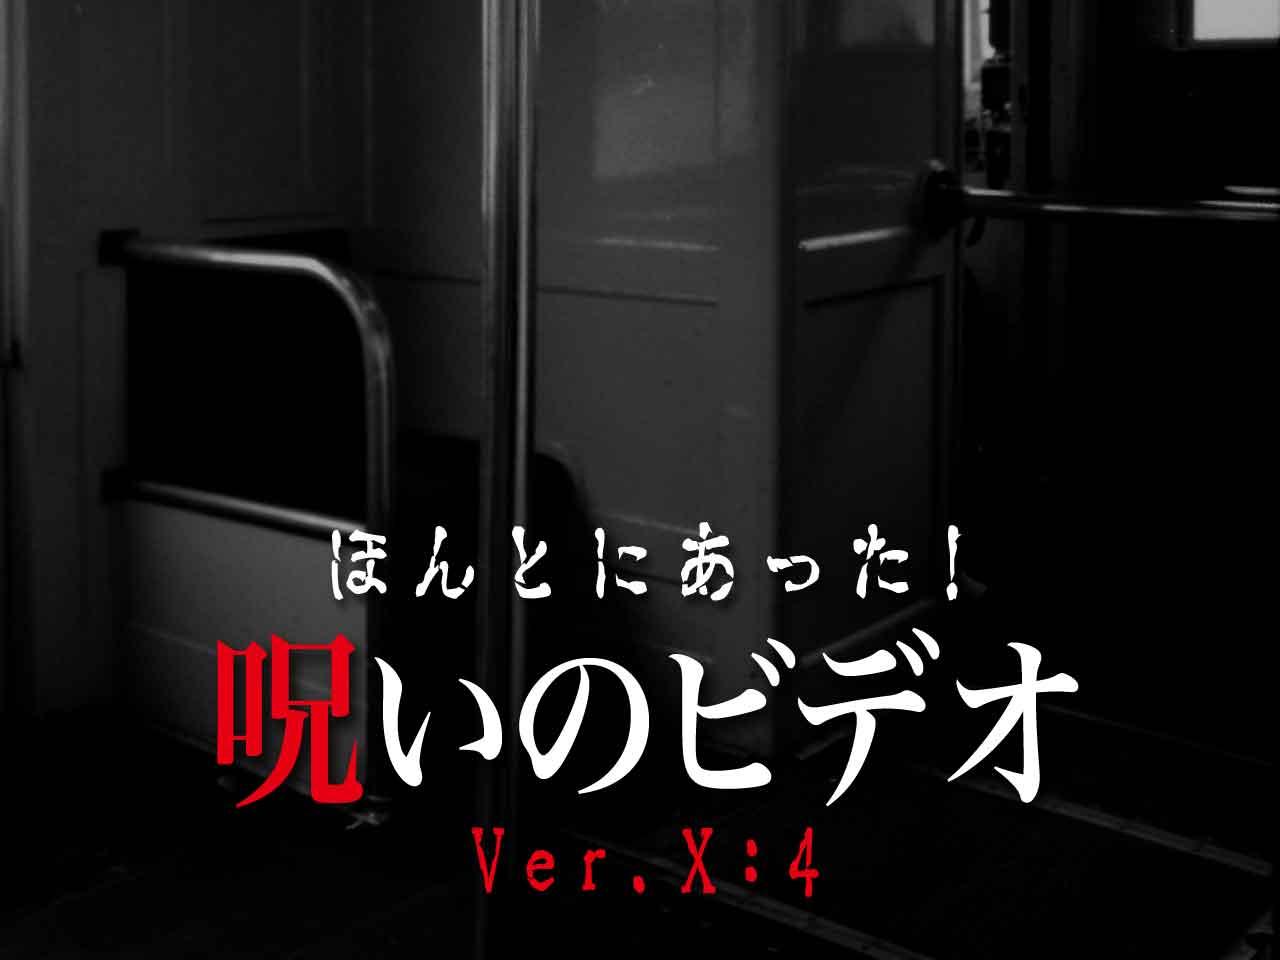 eye_catch_noro_-verx4